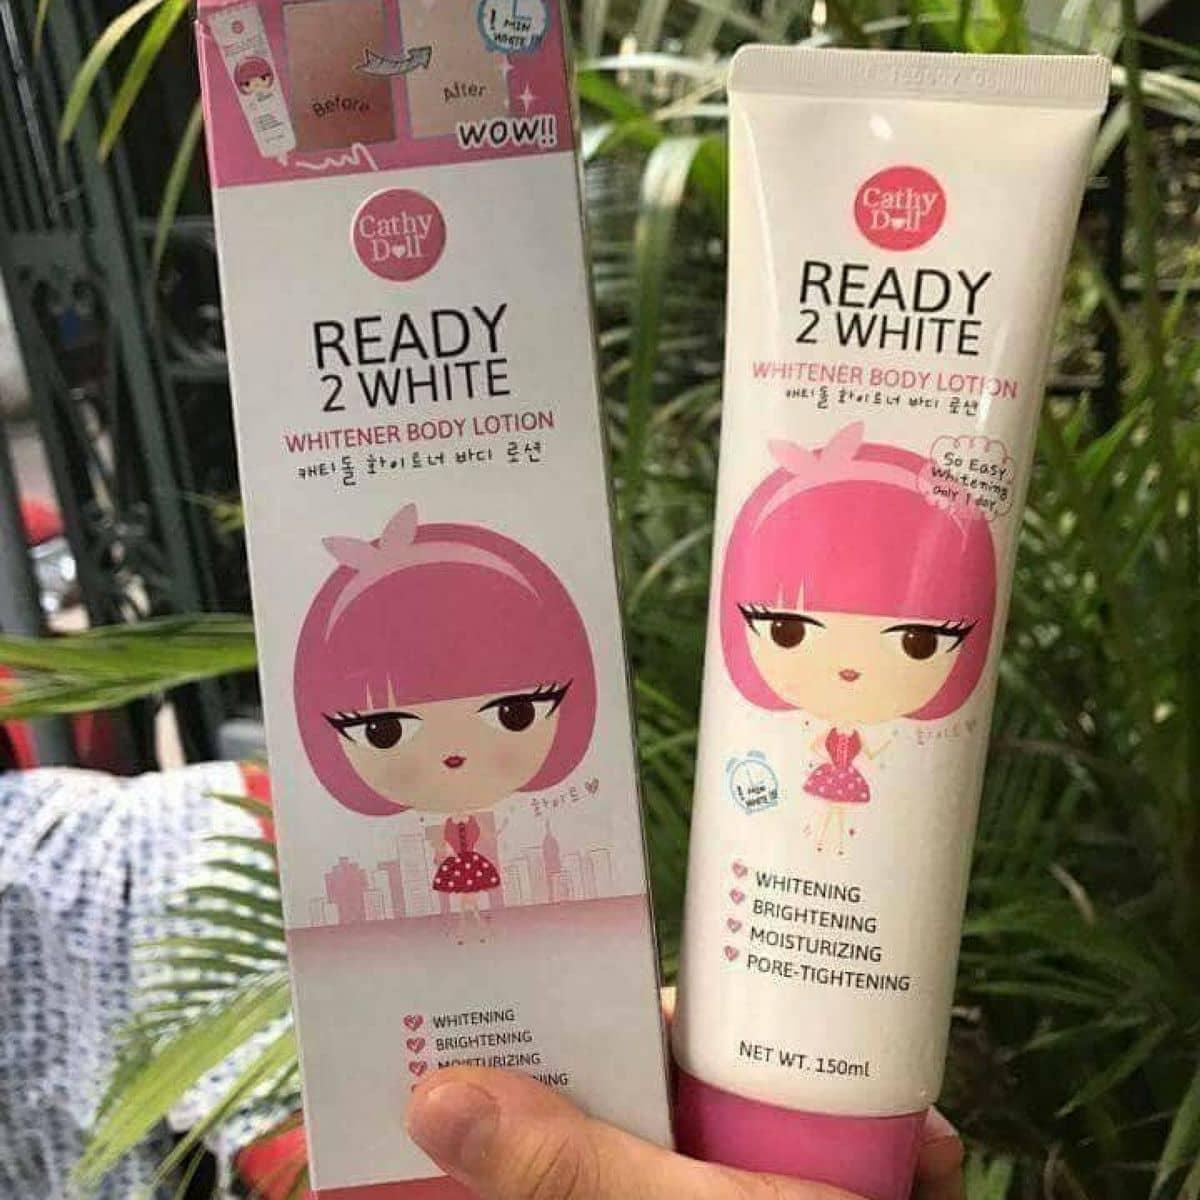 Sa Dng Trng Cathy Doll Ready 2 White Ti Gym 9999 Kha Vn Cn Whitener Body Lotion 150ml Ca Cherryhan1996 Lozi